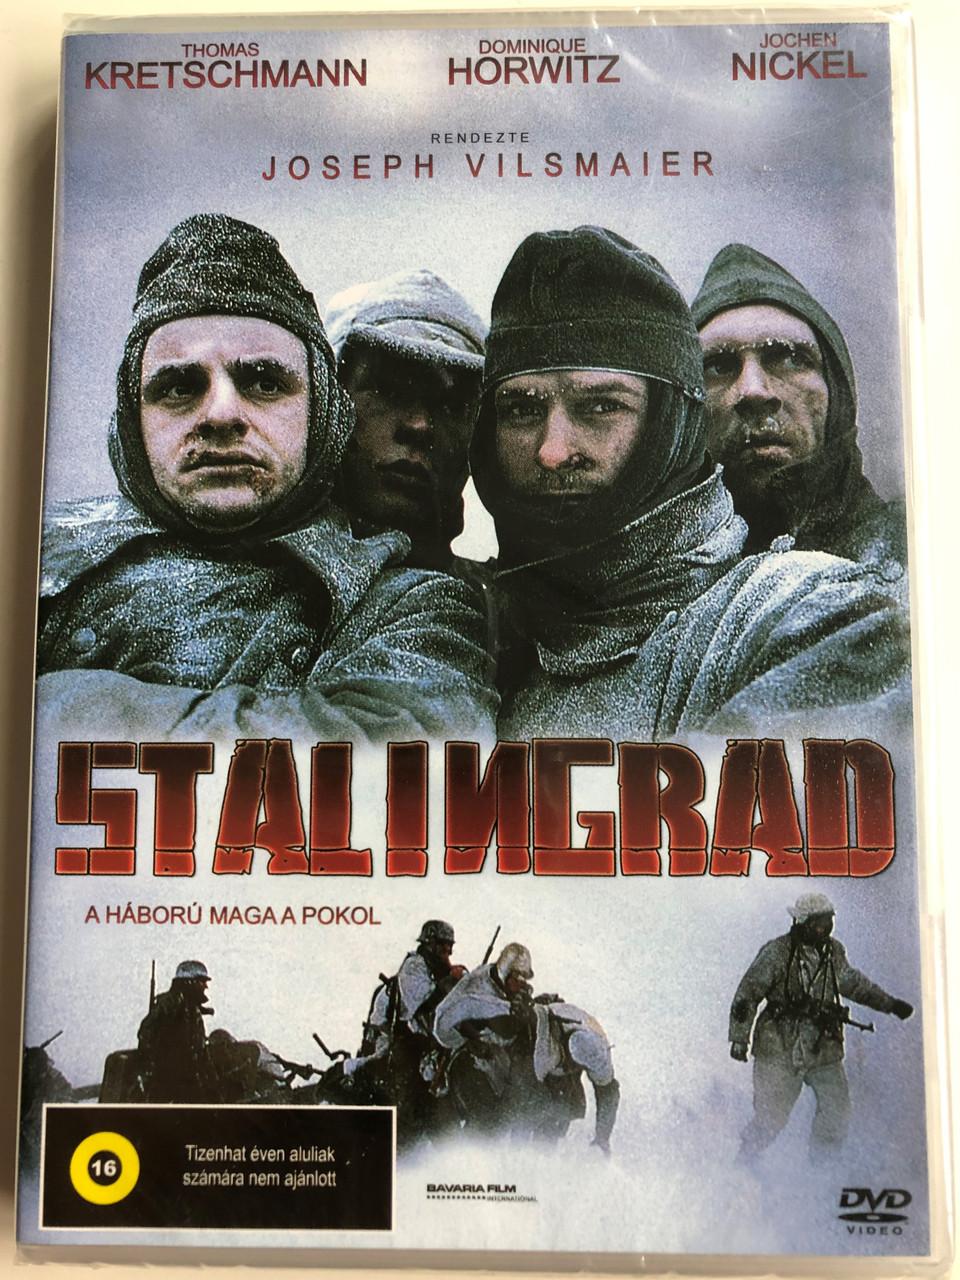 Stalingrad Dvd 1992 A Haboru Maga A Pokol Directed By Joseph Vilsmaier Starring Dominique Horwitz Thomas Kretschmann Jochen Nickel Bibleinmylanguage